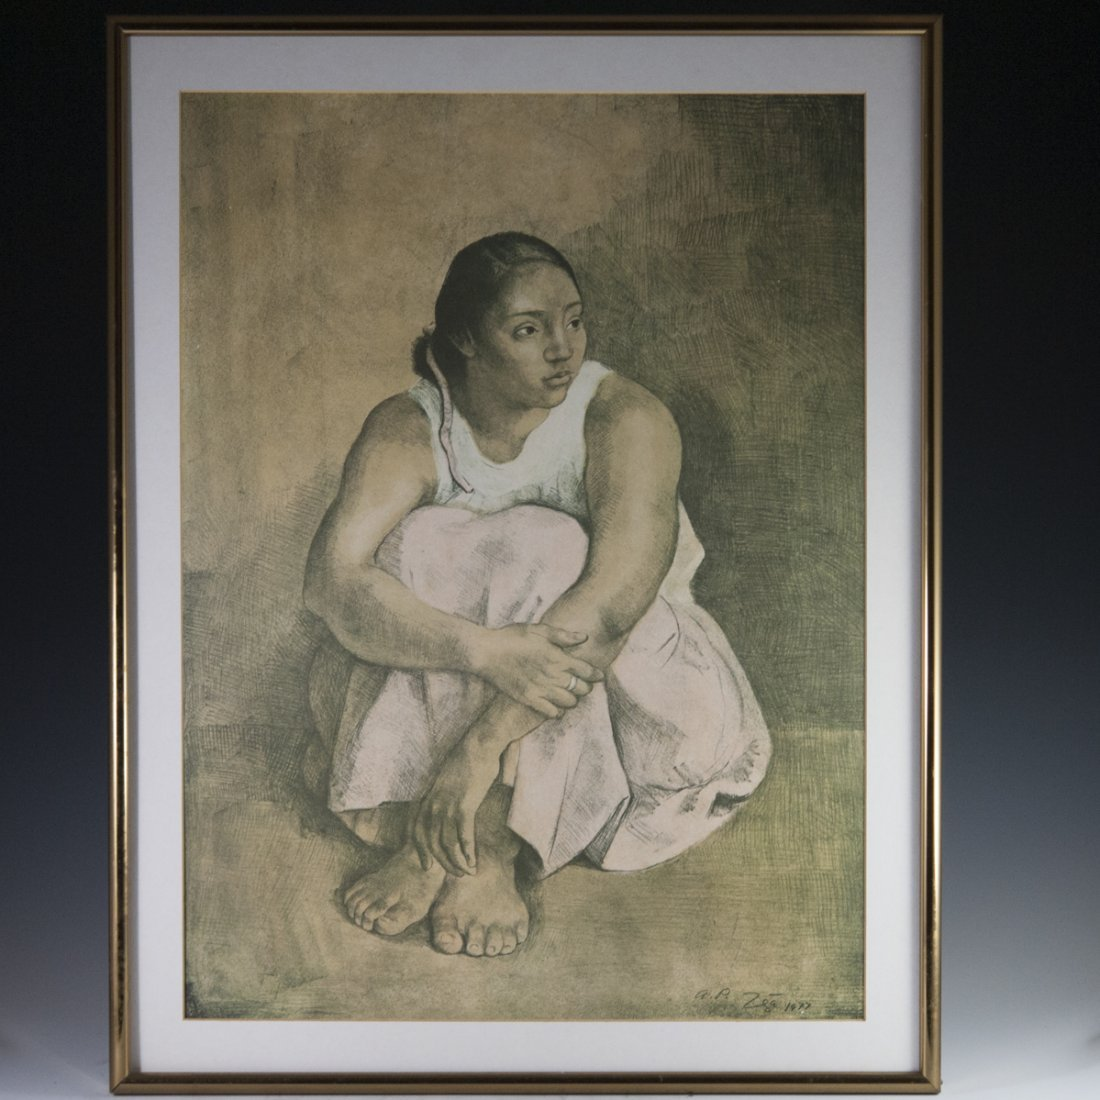 Francisco Zuniga (Mexican 1912-1998)